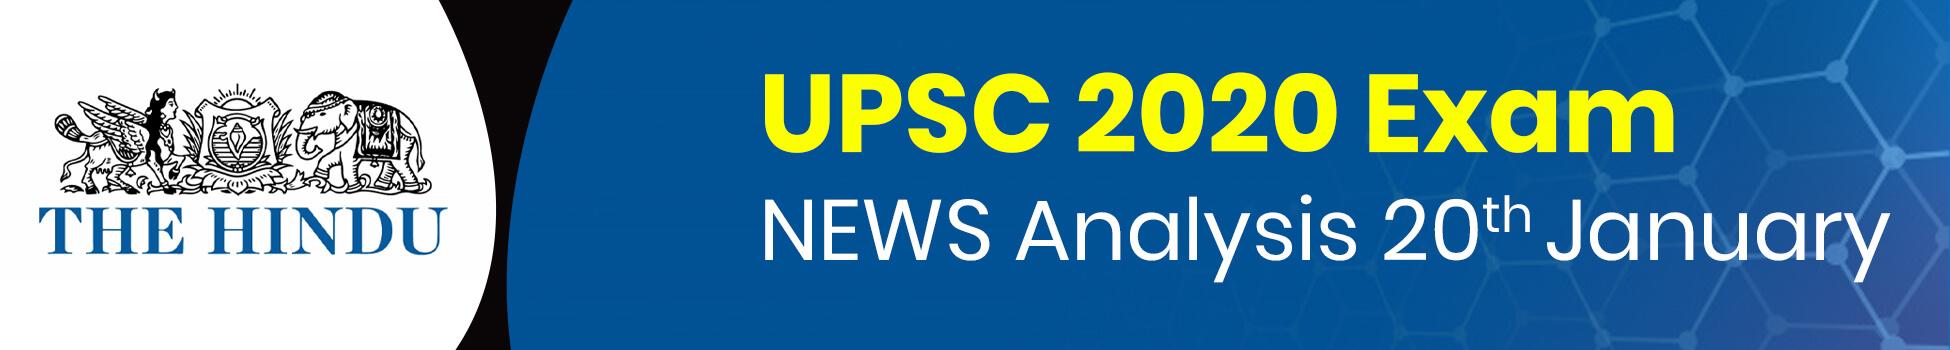 UPSC 2020 Exam - NEWS Analysis 20th January